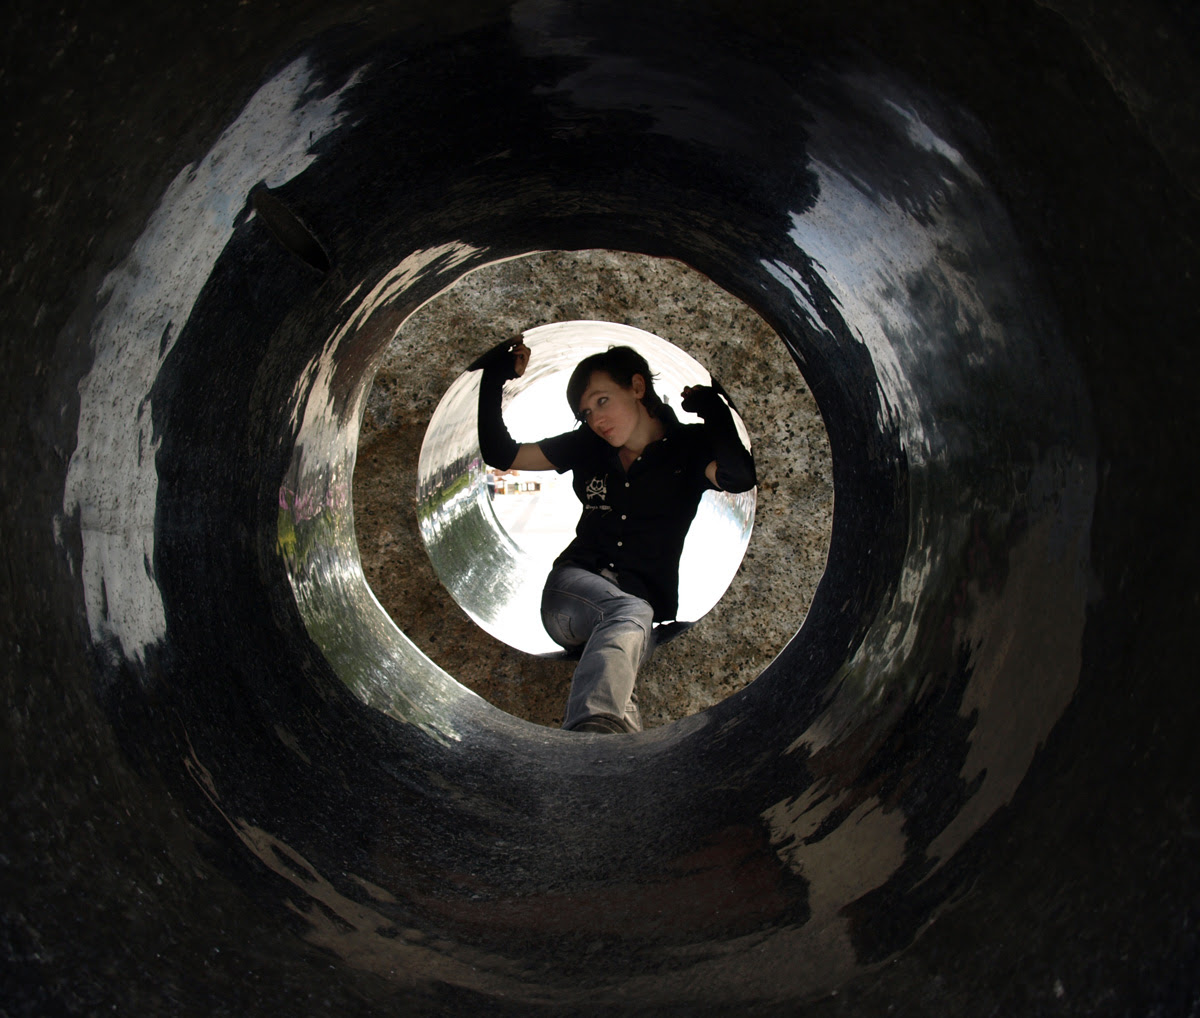 Down_the_rabbit_hole_by_tvillingsjeler Prepping for Prepping